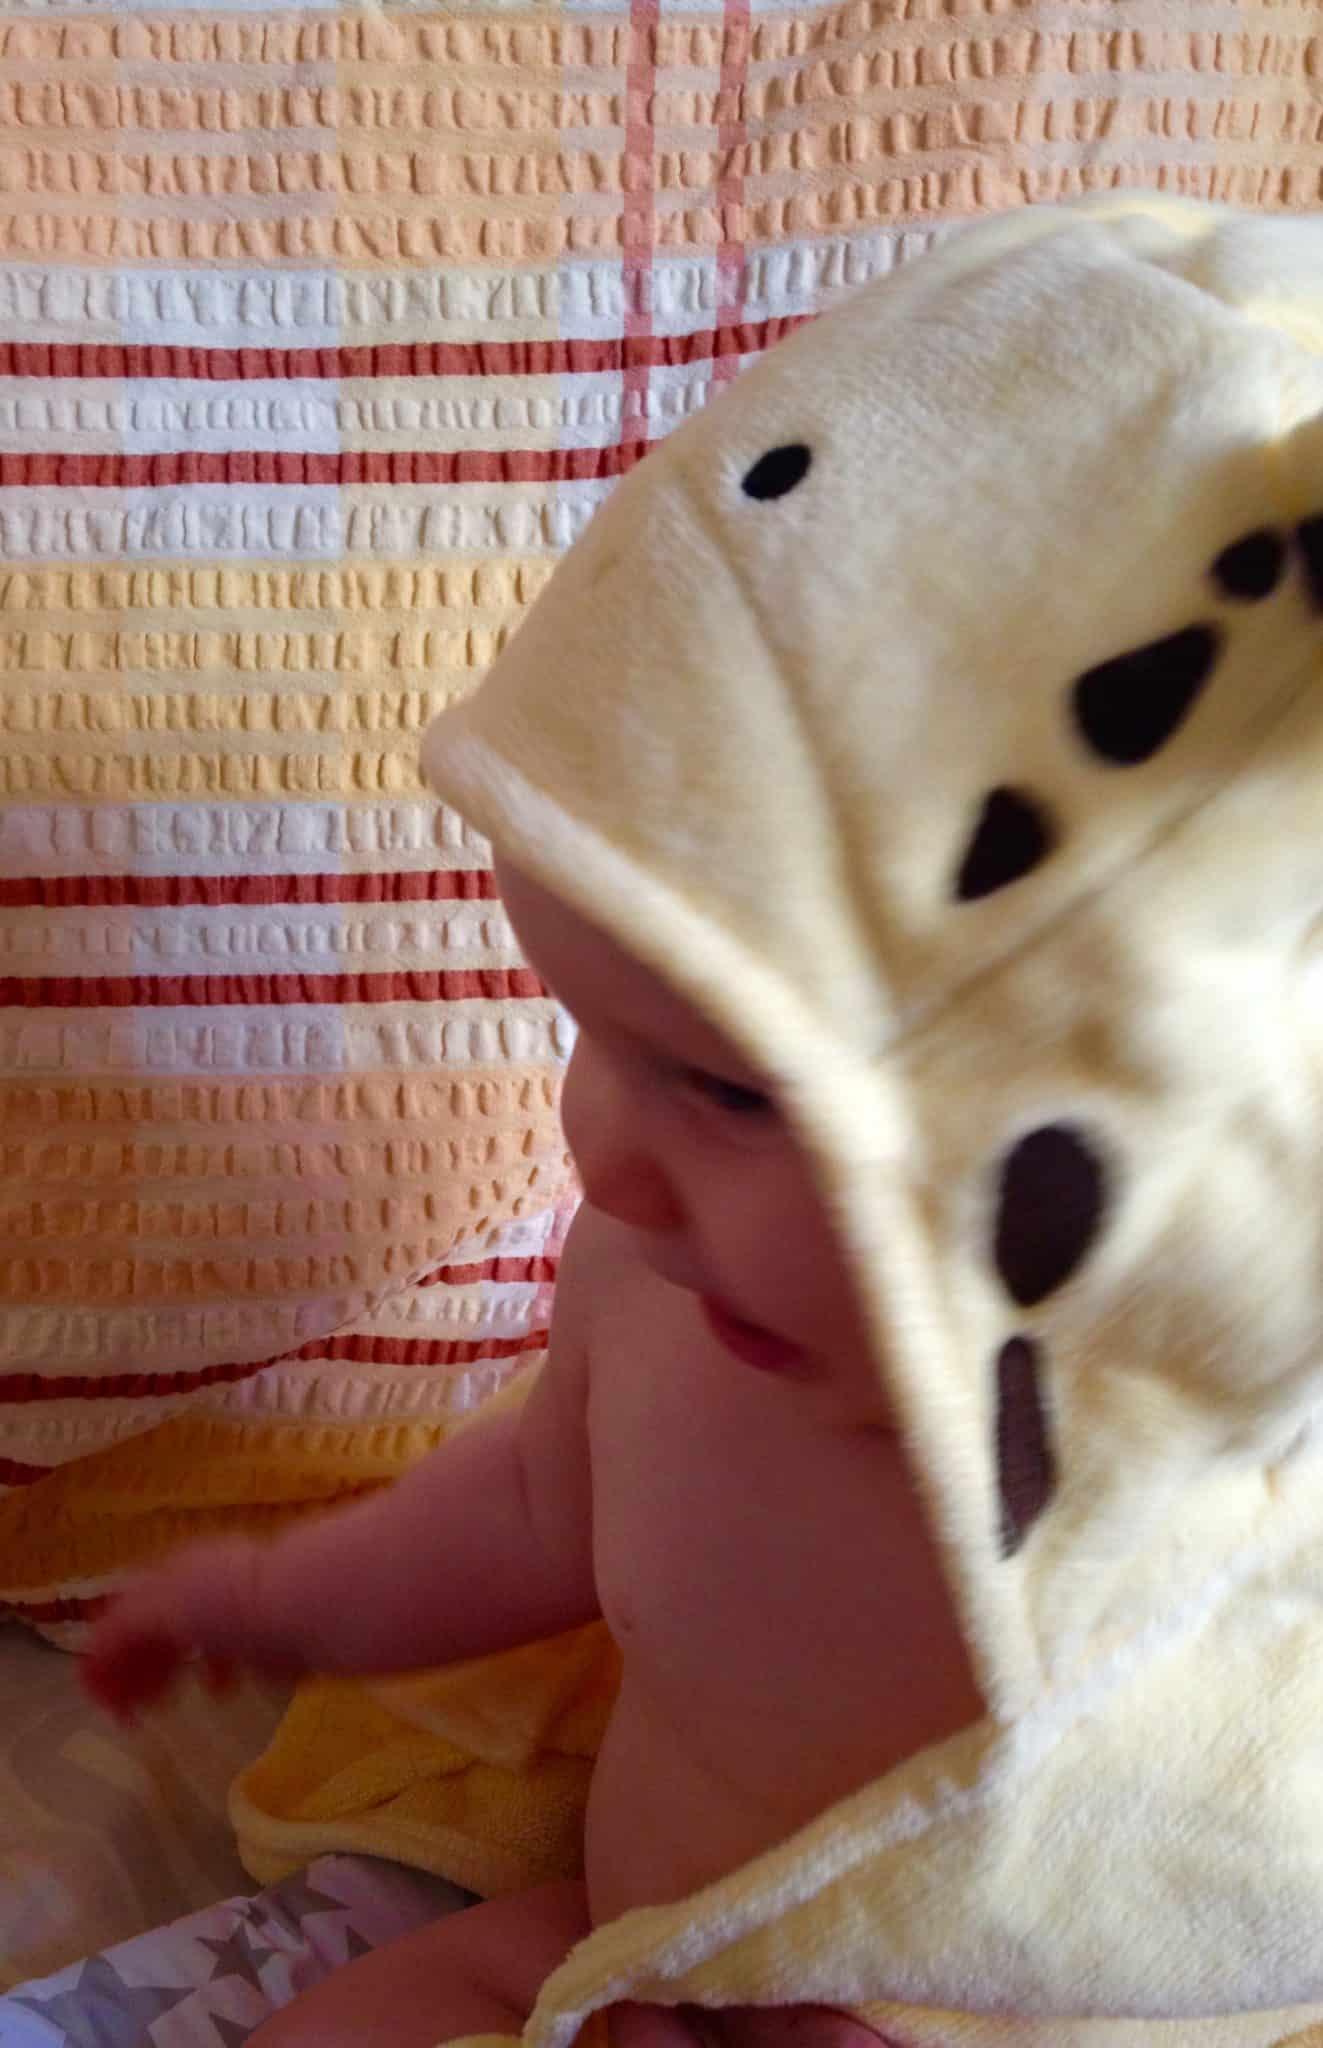 baby girl with her giraffe hooded towel on